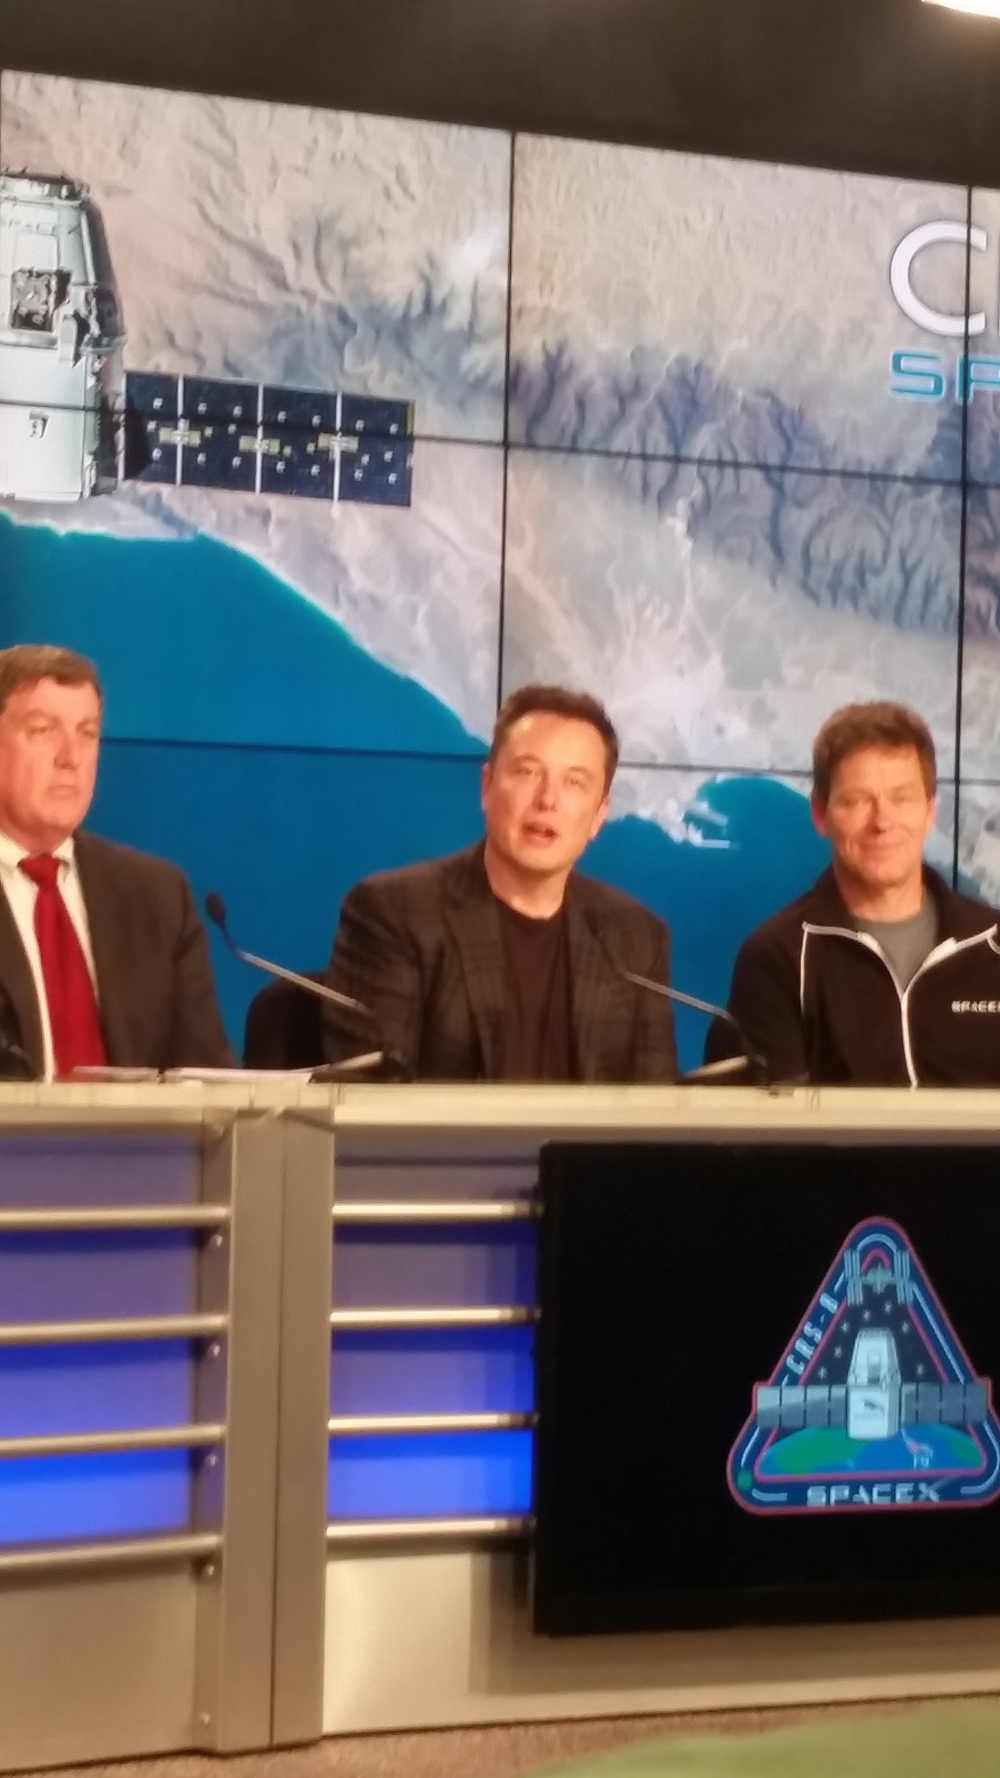 Elon Musk at Press Conference